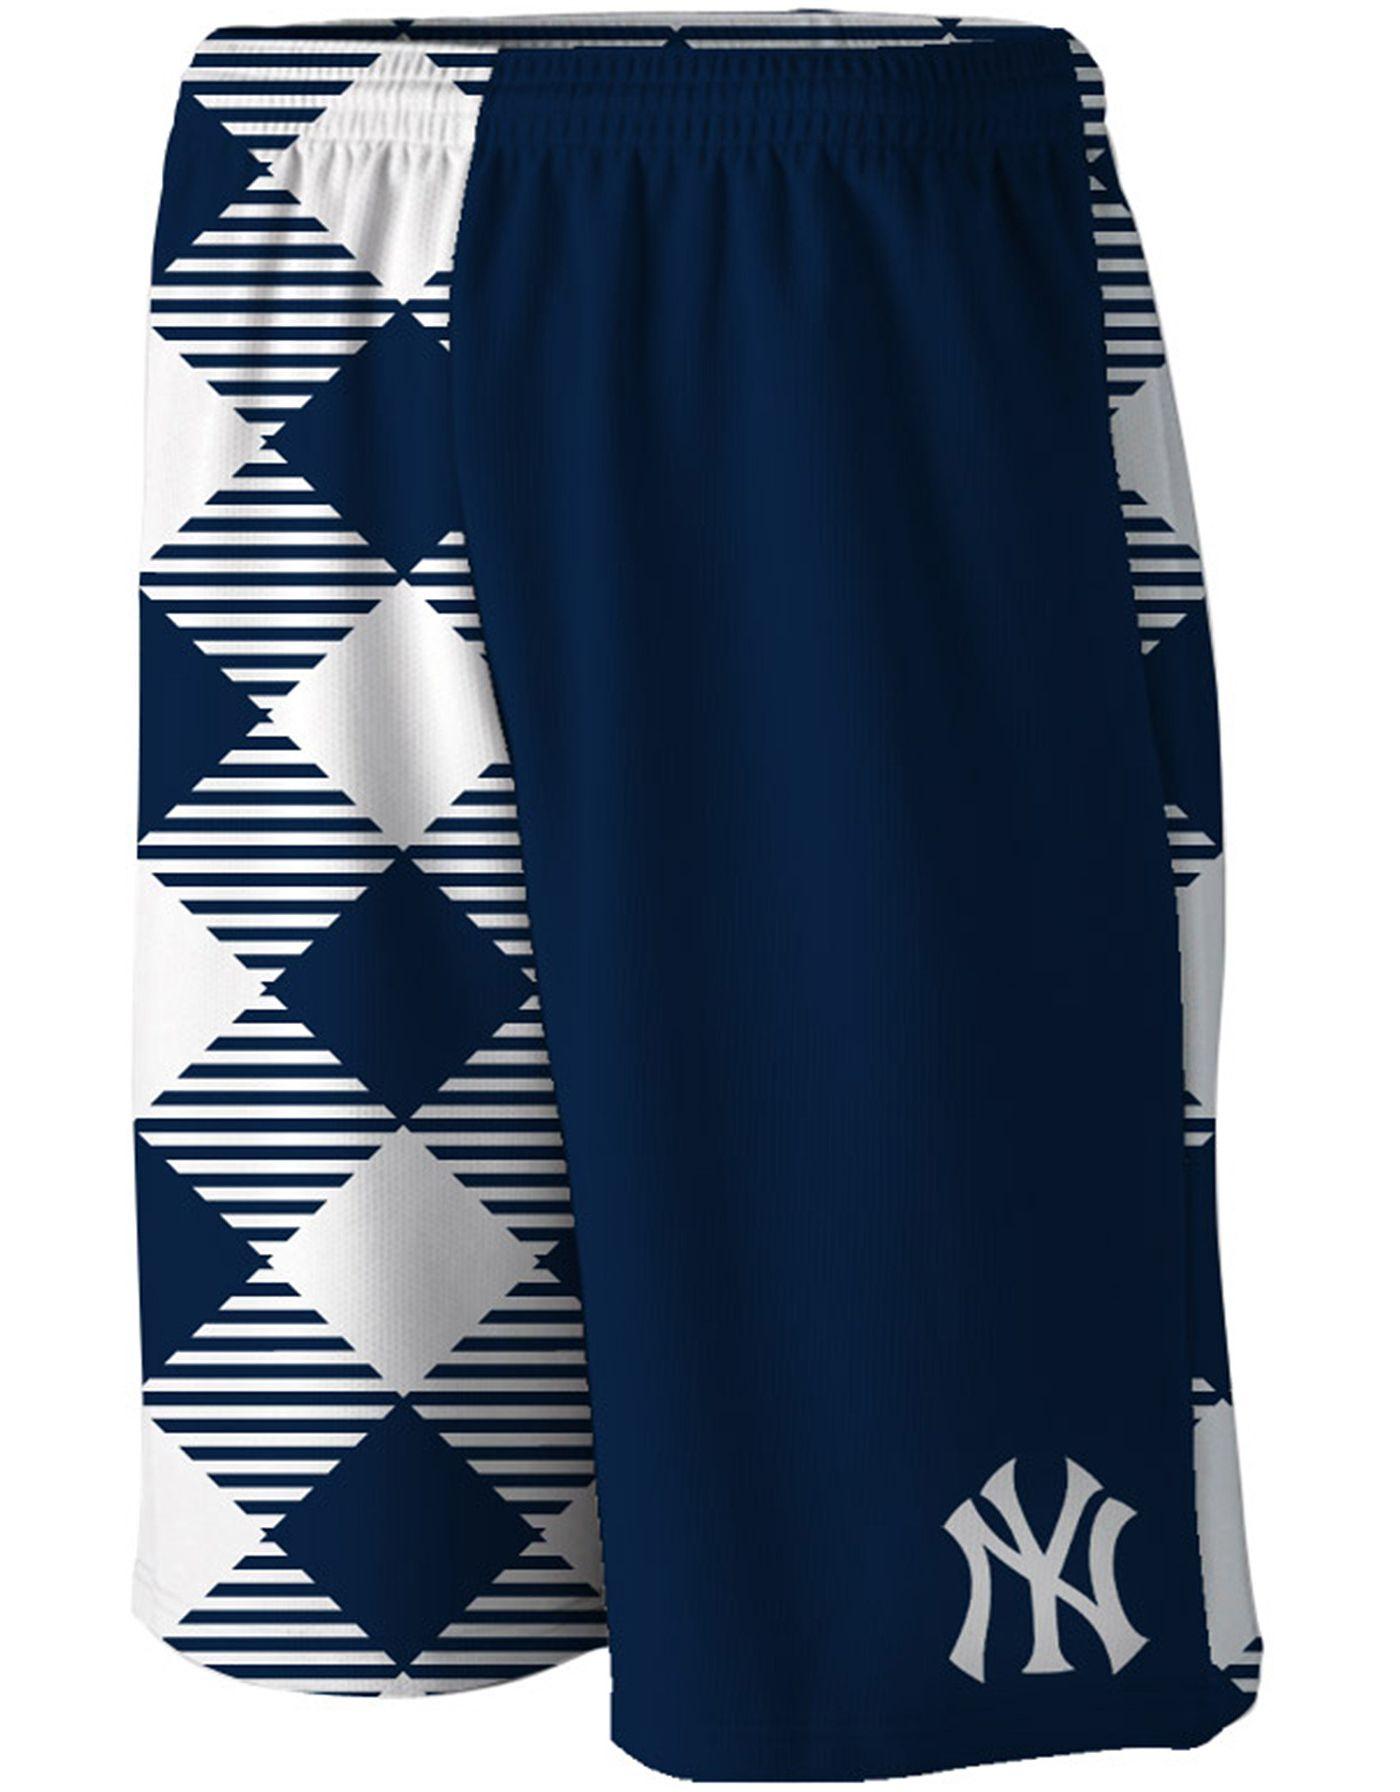 Loudmouth Men's New York Yankees Gym Shorts